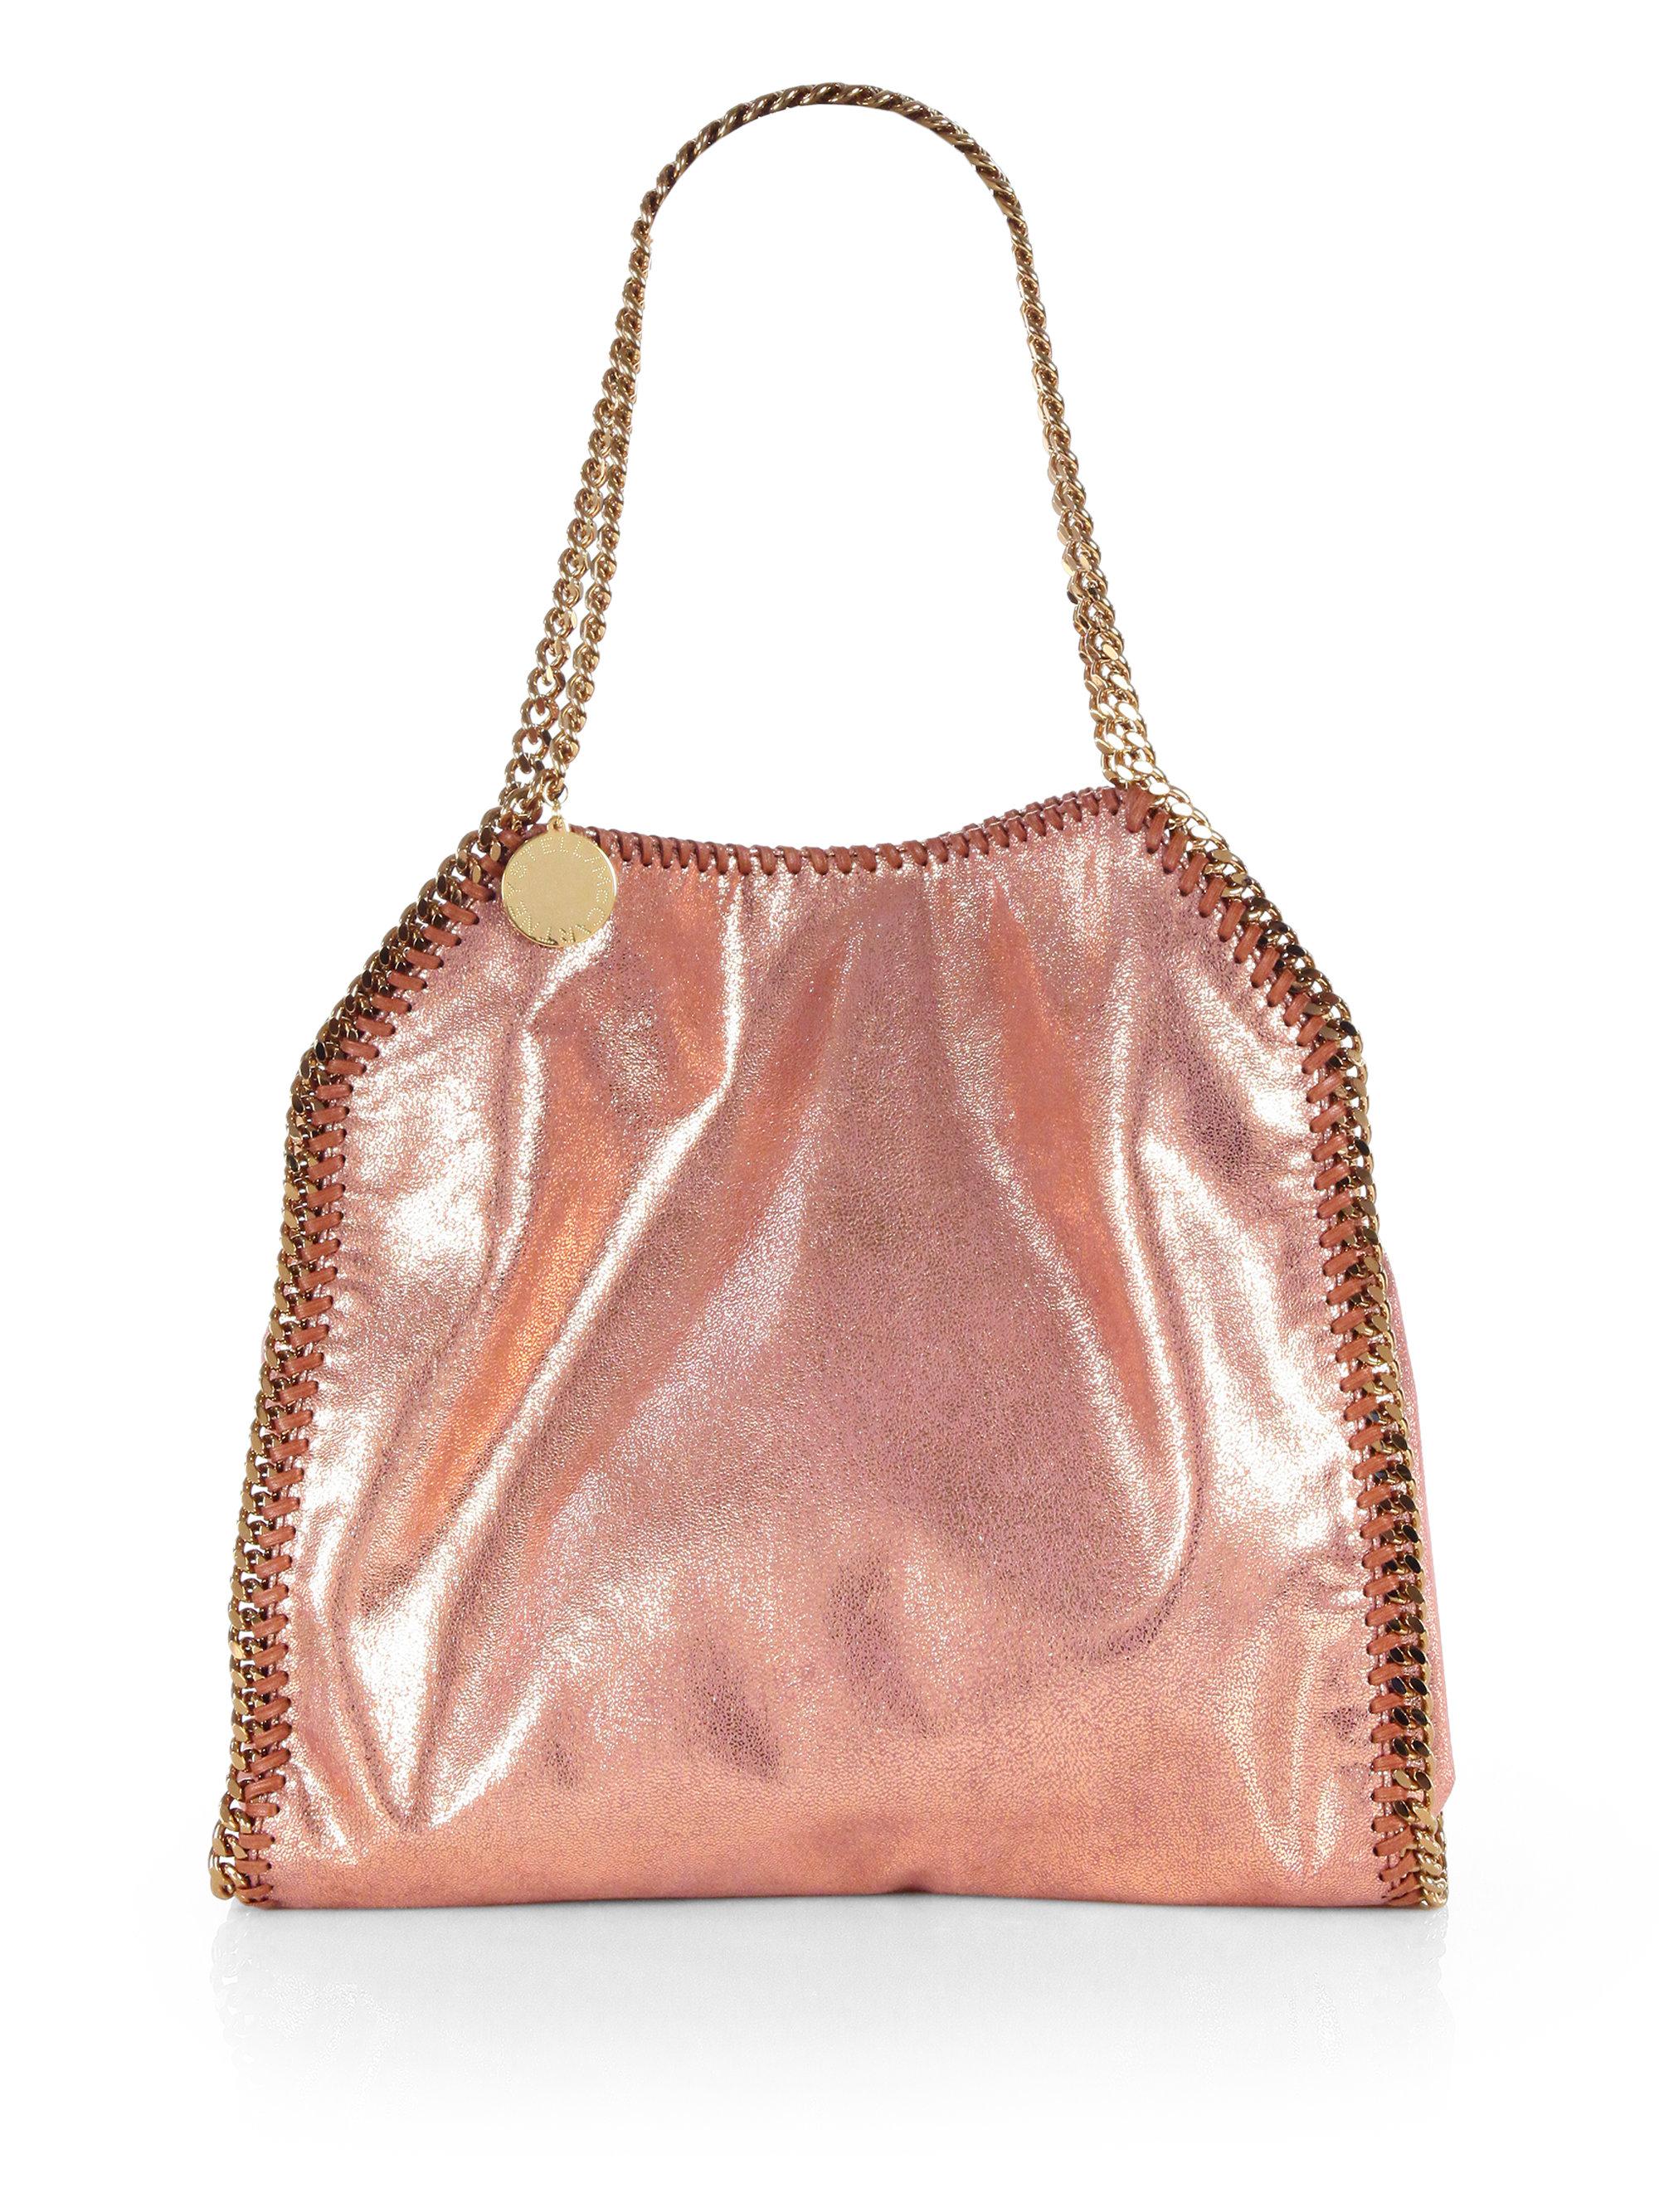 lyst stella mccartney baby bella metallic shoulder bag in brown. Black Bedroom Furniture Sets. Home Design Ideas